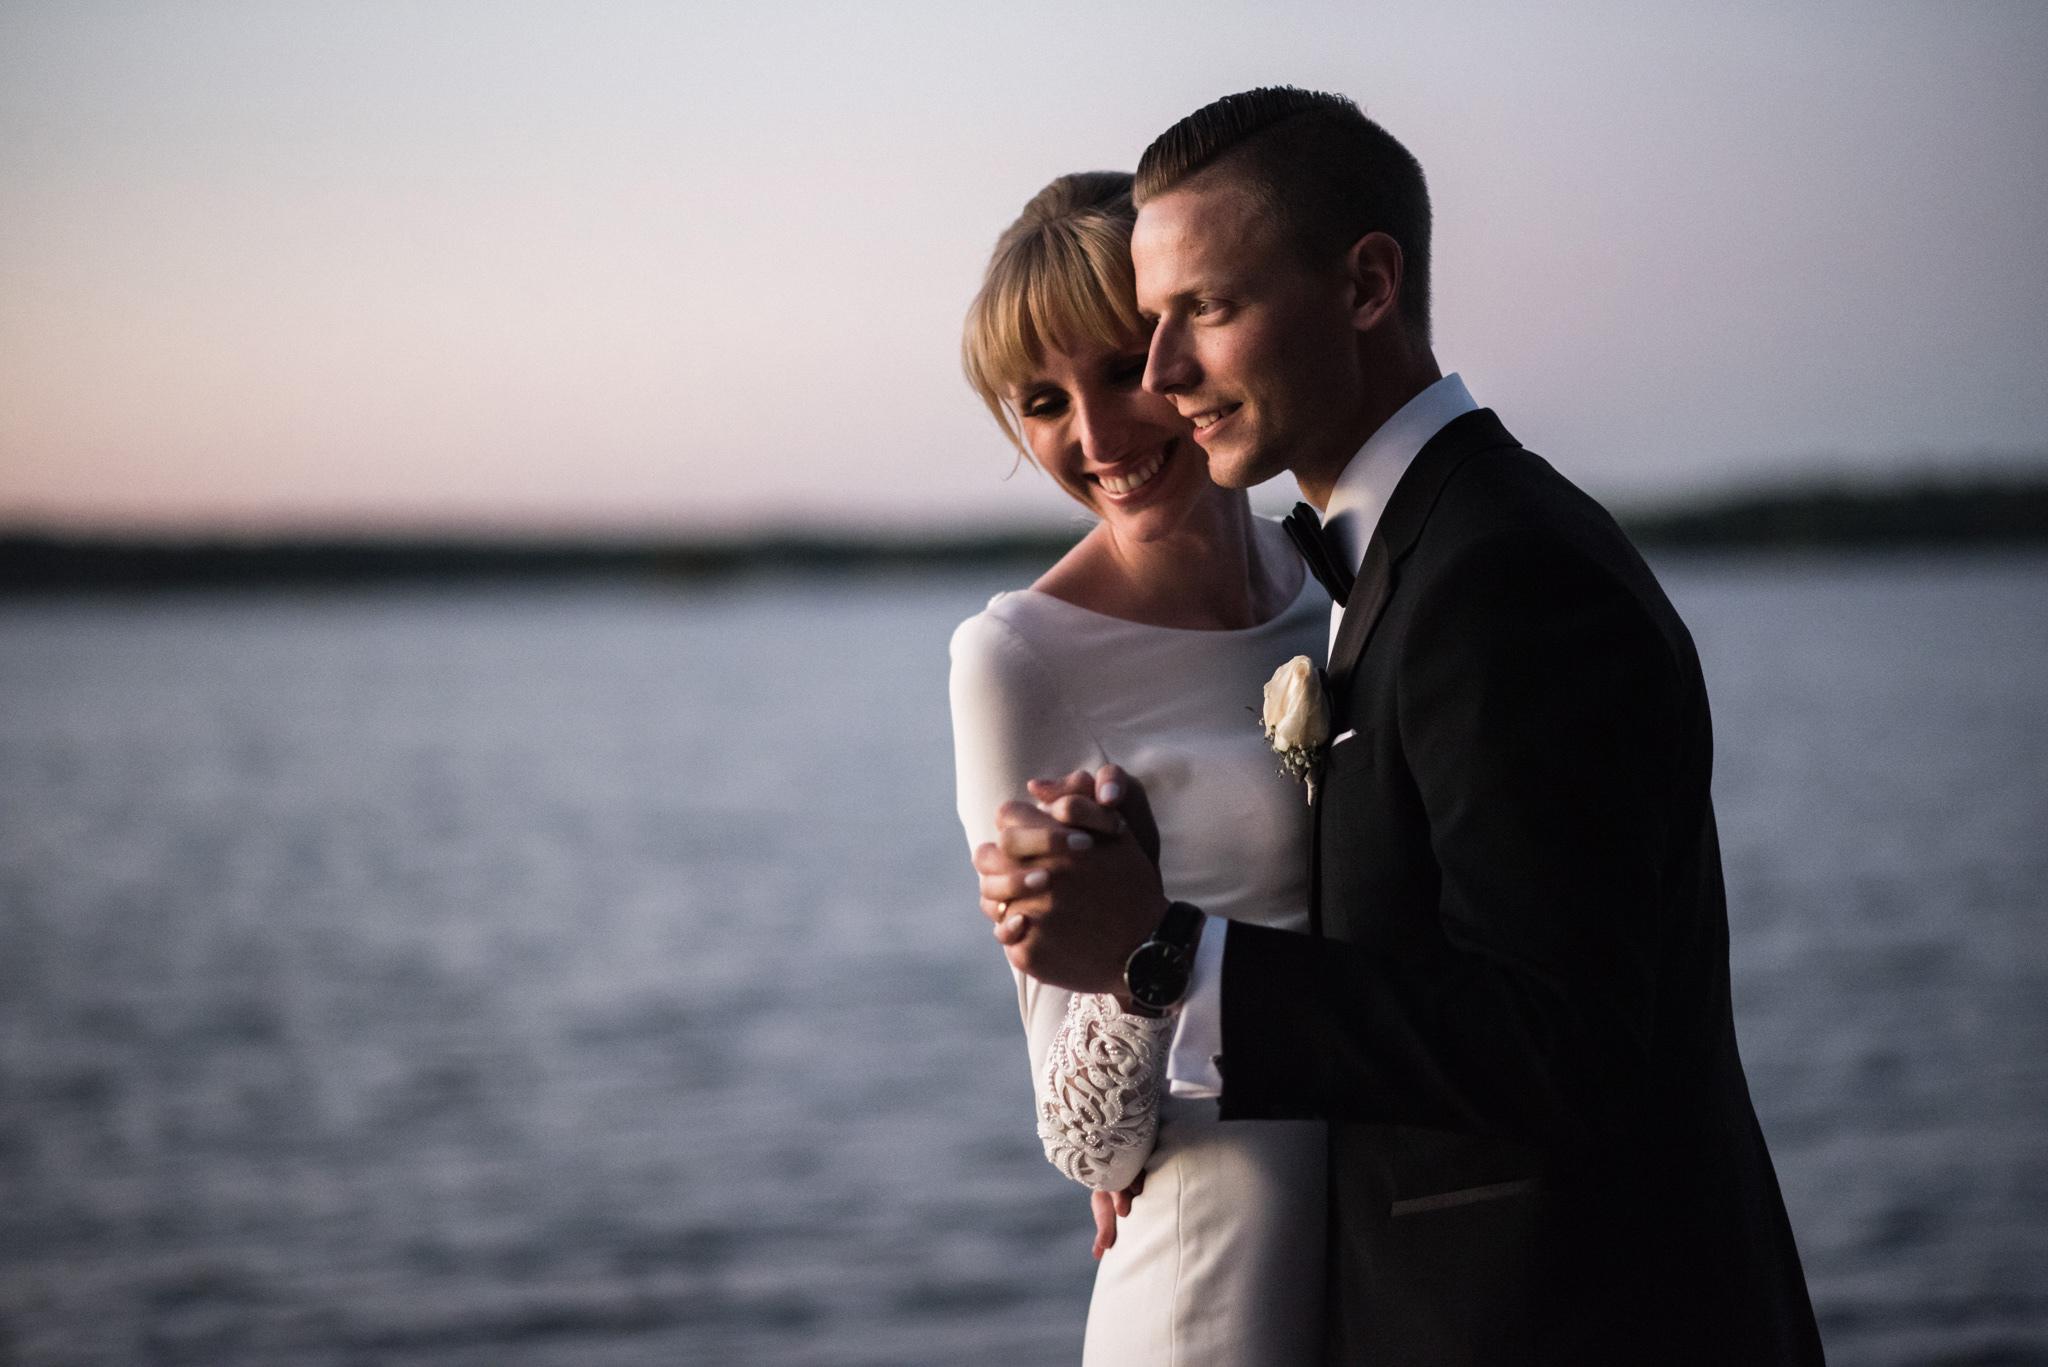 013-romantic-toronto-wedding-photographer-ontario-cottage-sunset.jpg